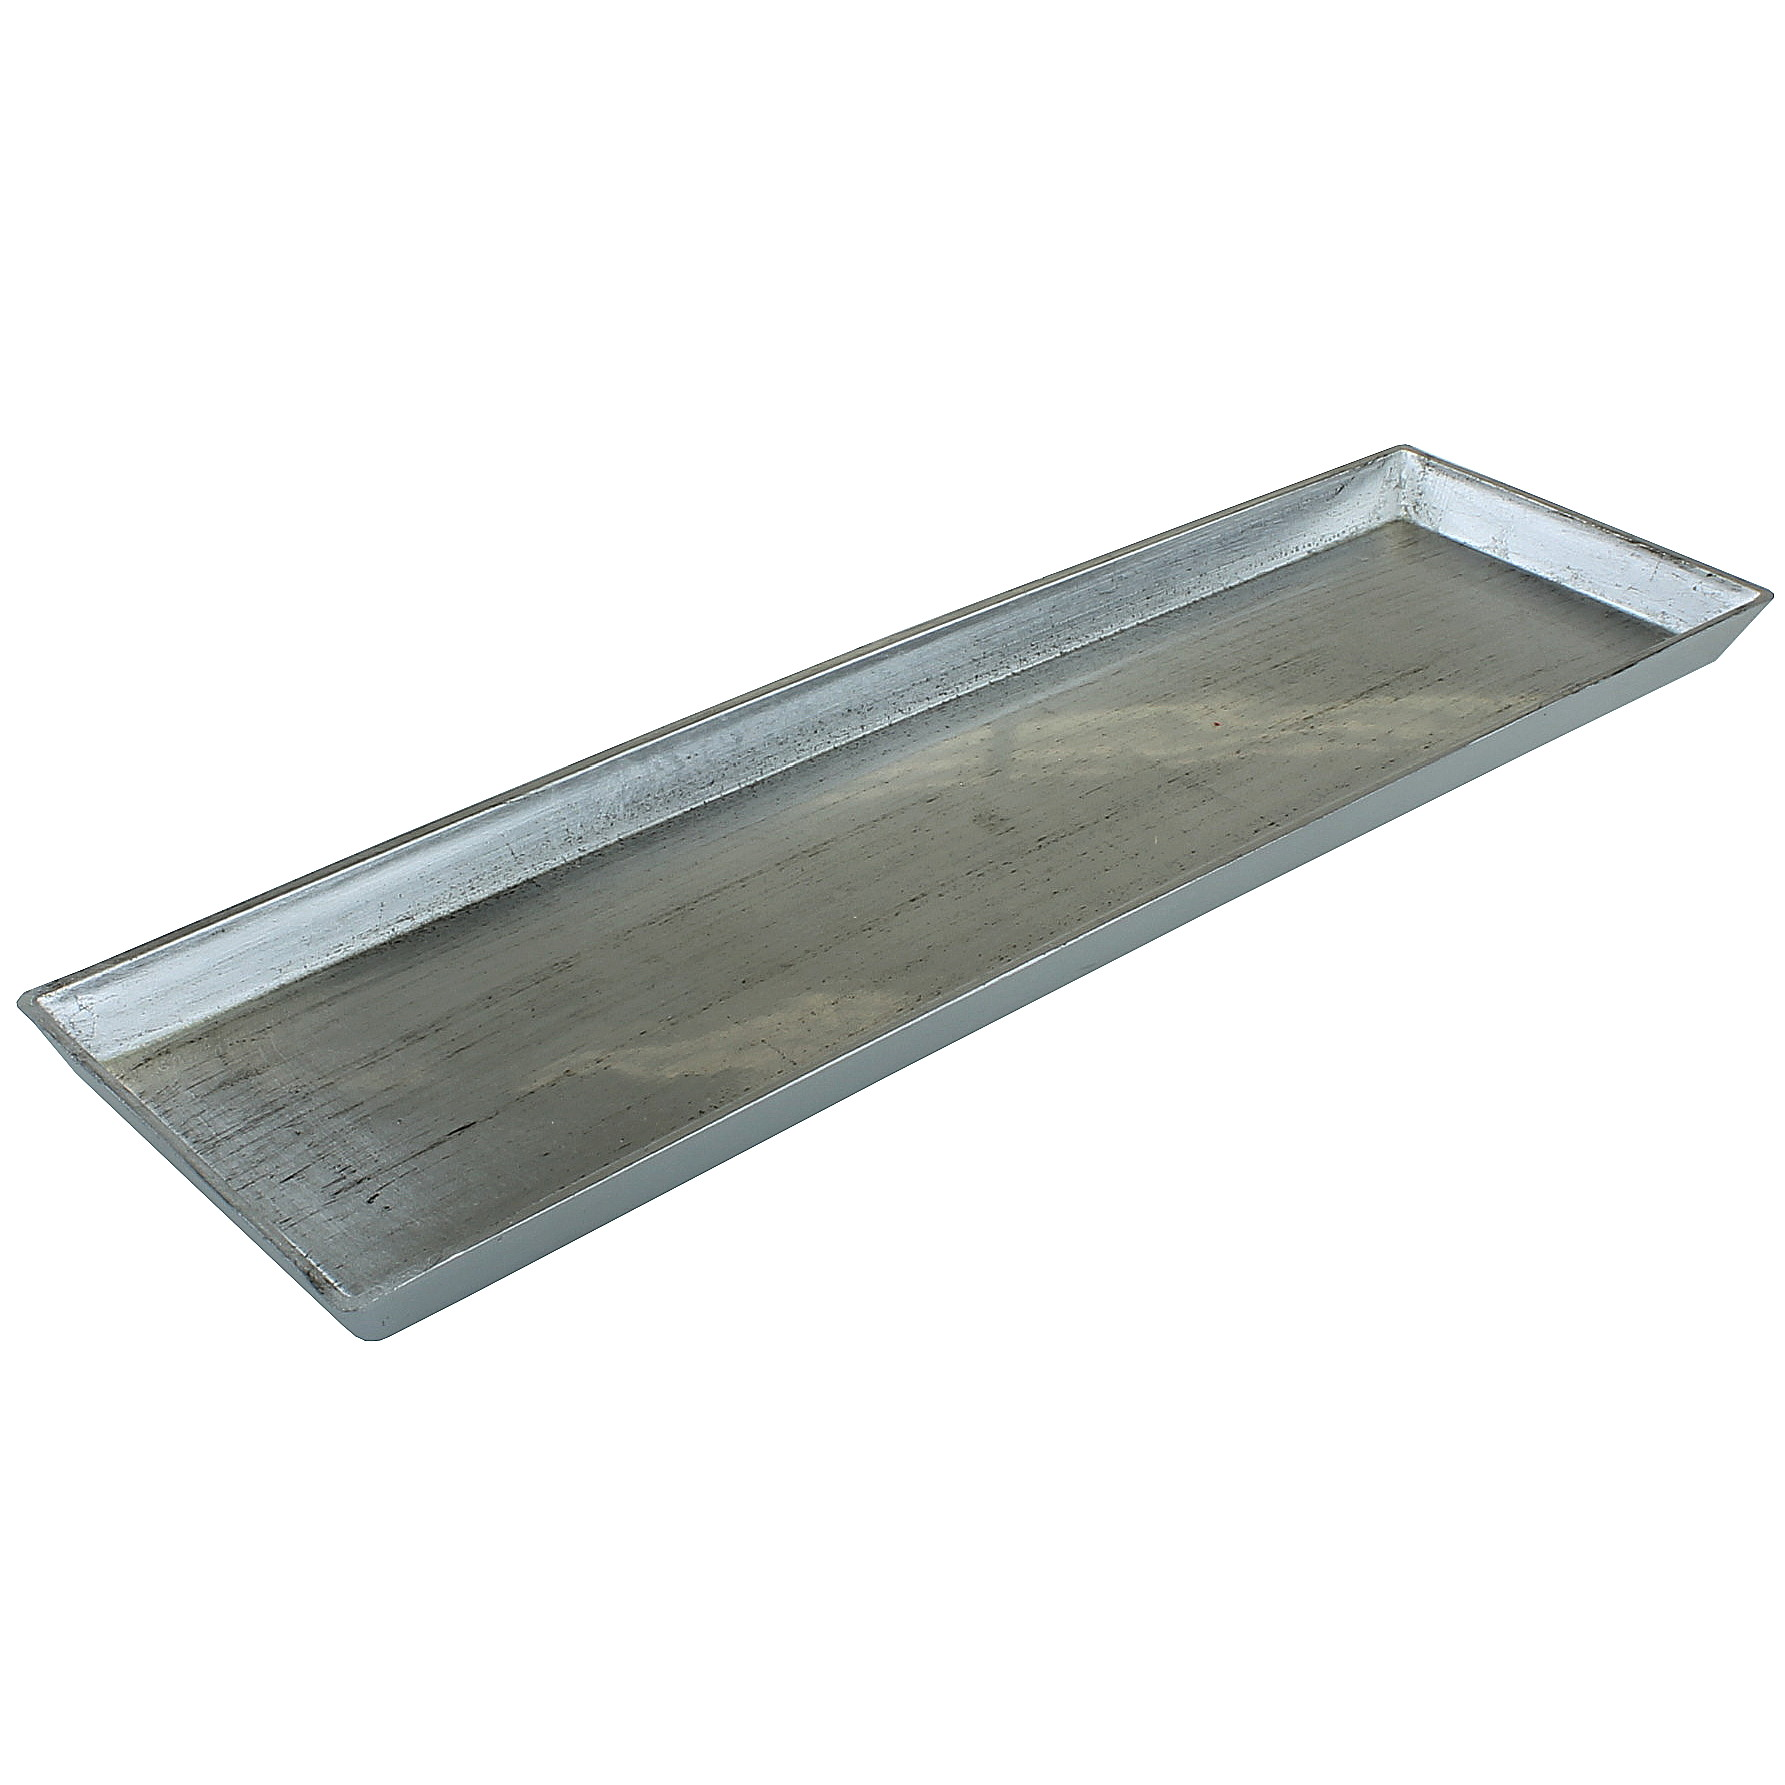 Deko Tablett Eckig Alt Silber Kerzenteller Platzteller Tisch Deko